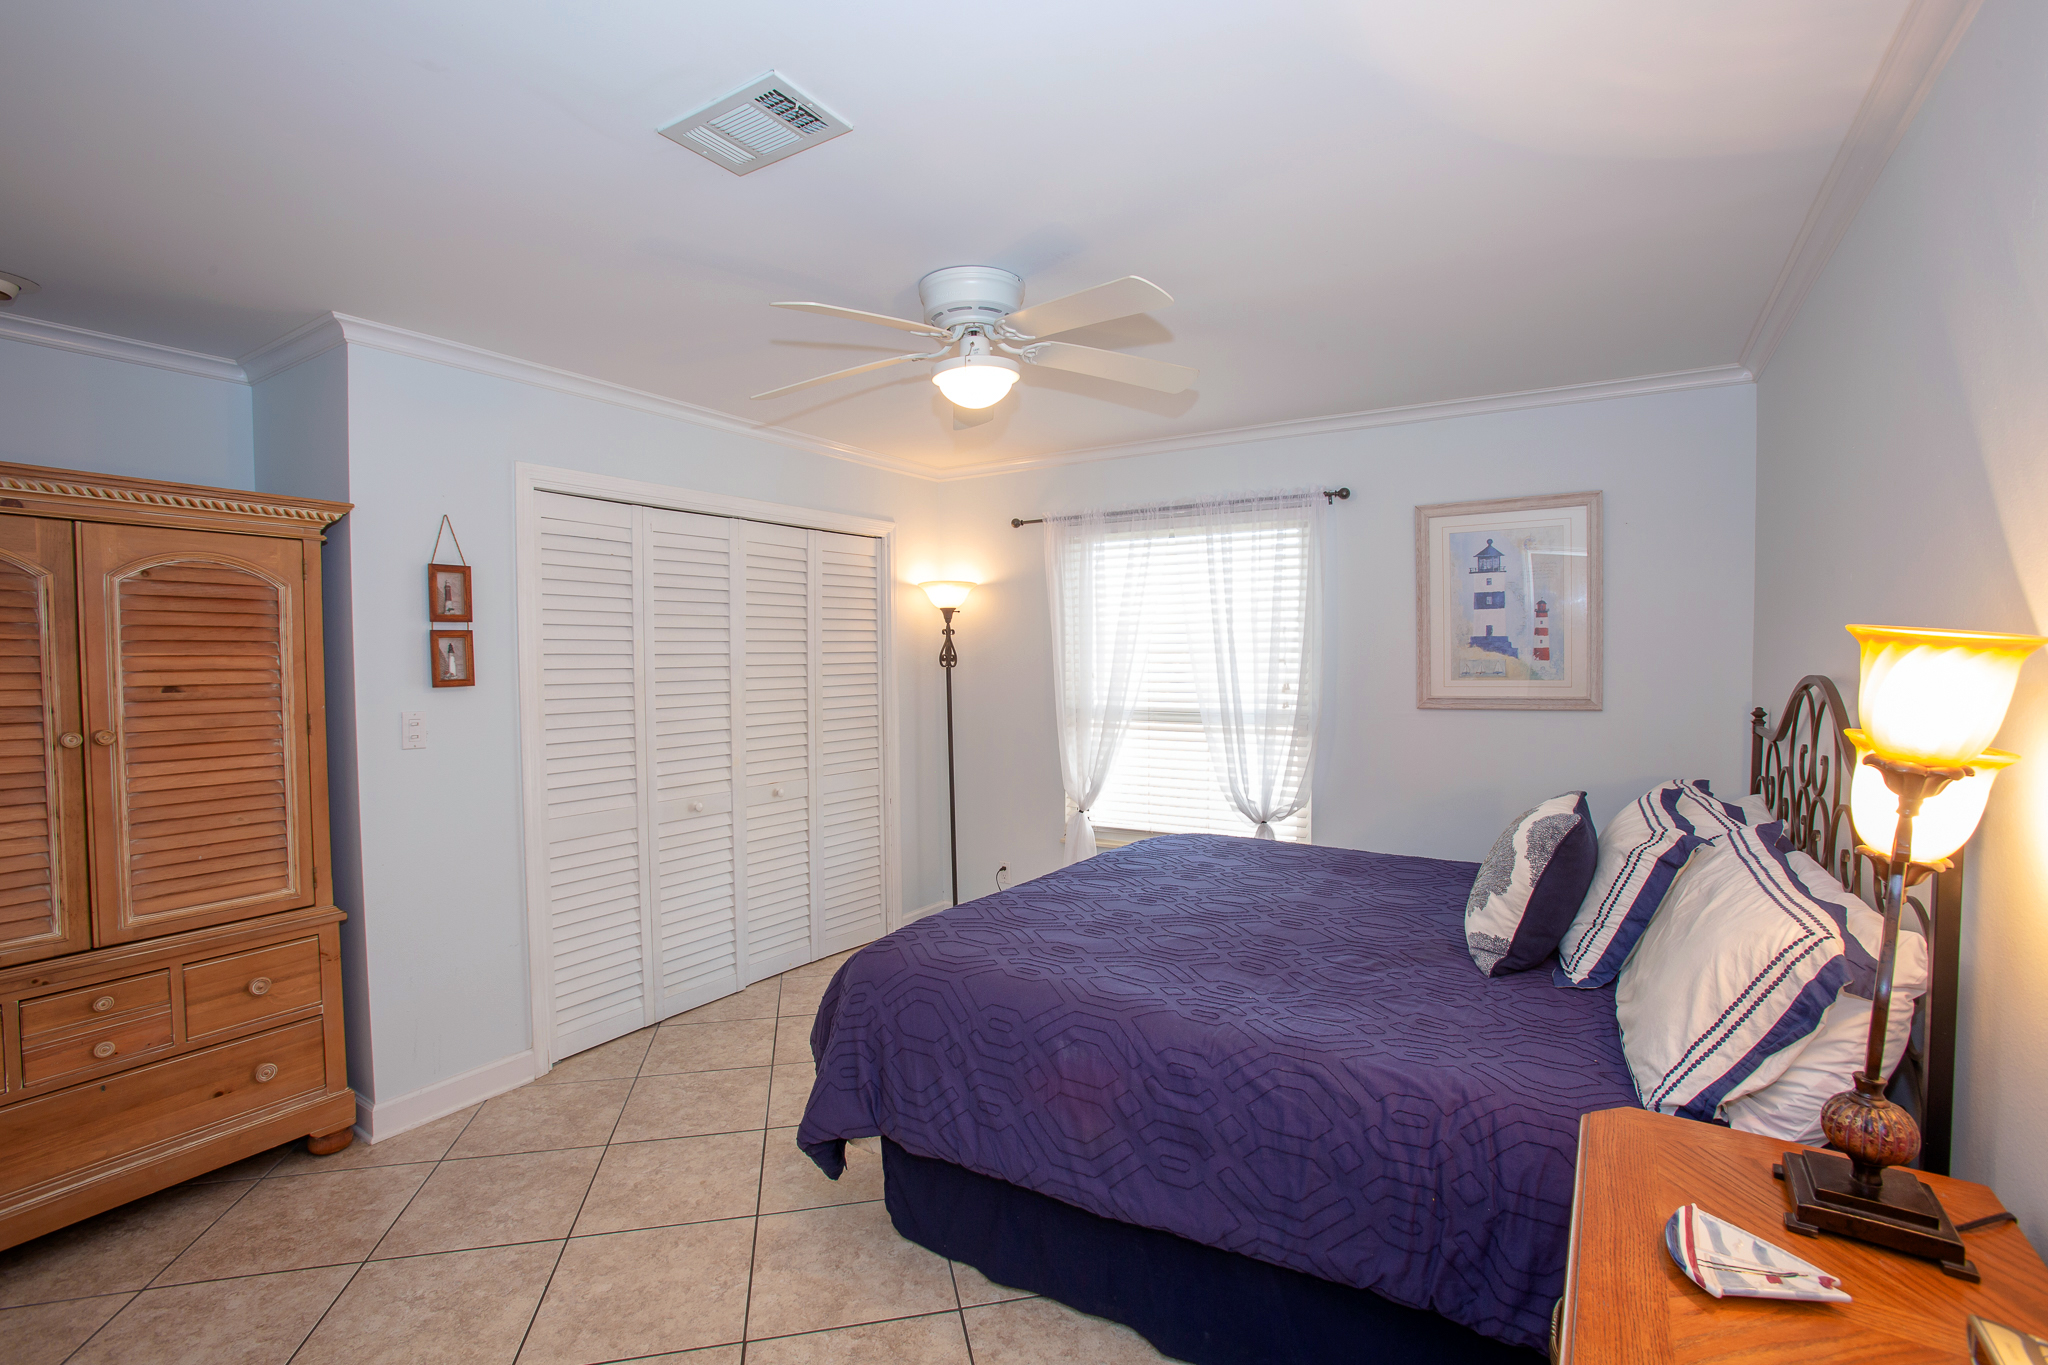 Maldonado 1015 - Sea the Big Picture House/Cottage rental in Pensacola Beach House Rentals in Pensacola Beach Florida - #13